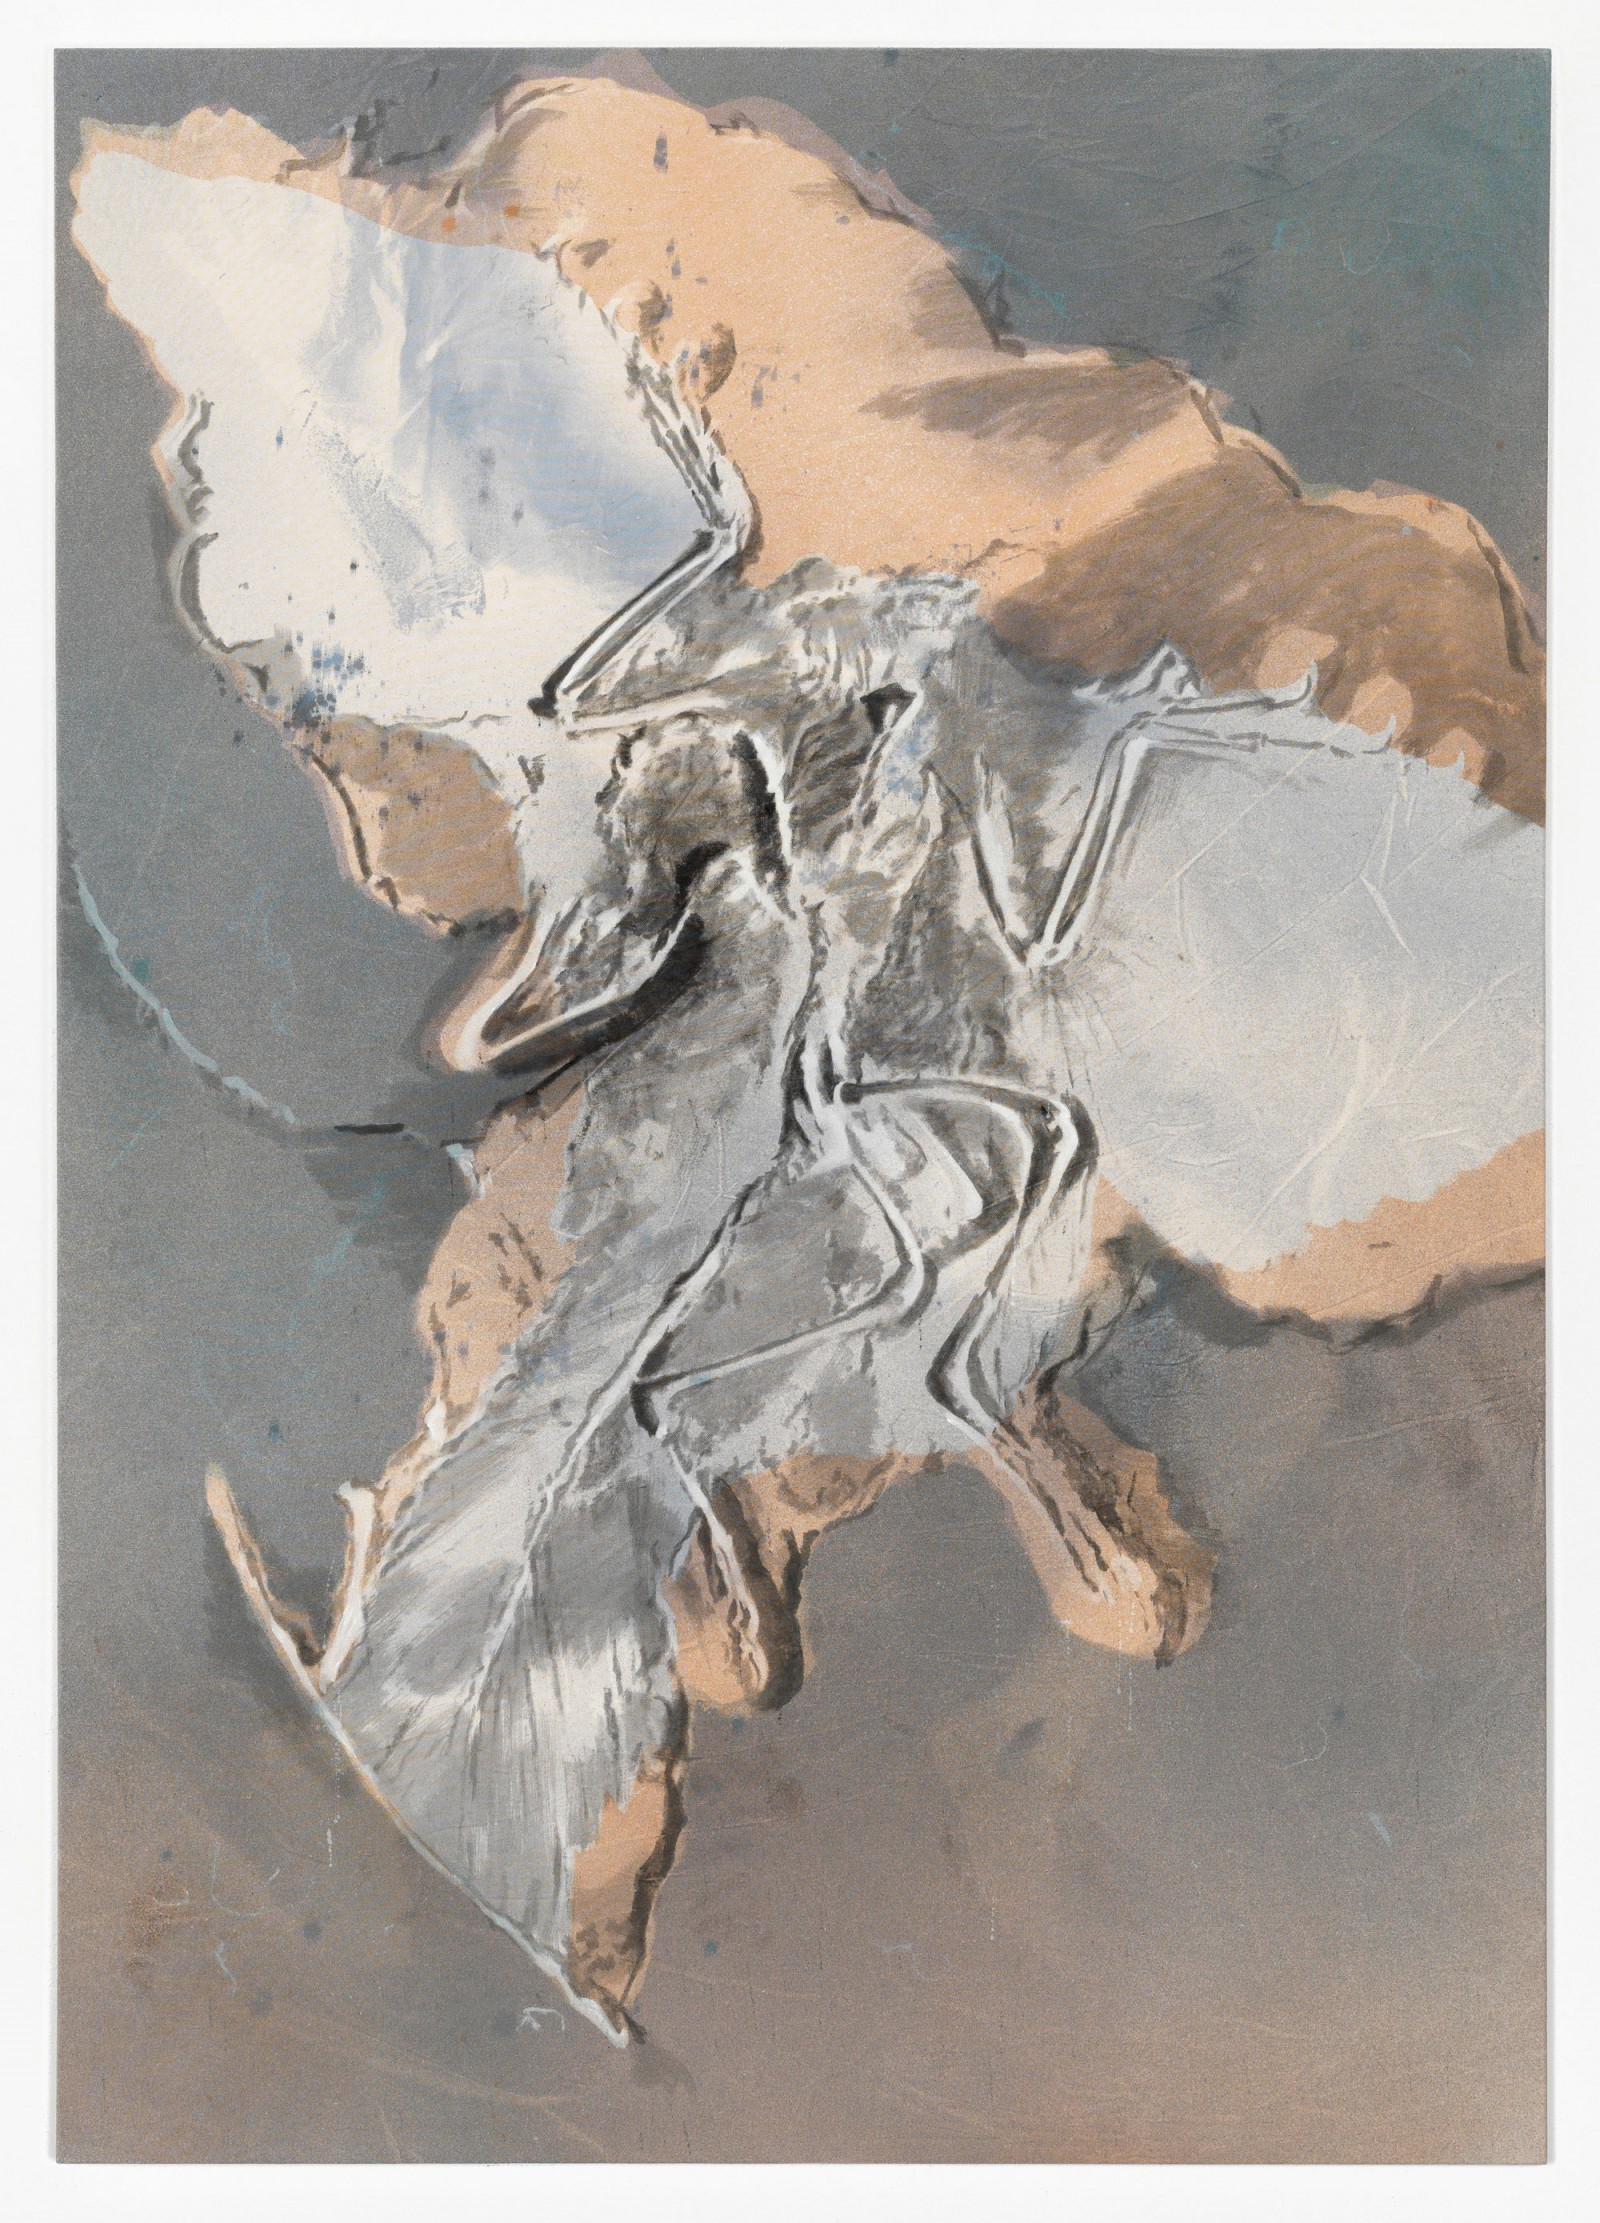 Kim Nekarda: untitled, 2011, vinyl color & body print on cotton, 200 x 140 cm, private collection, lingen